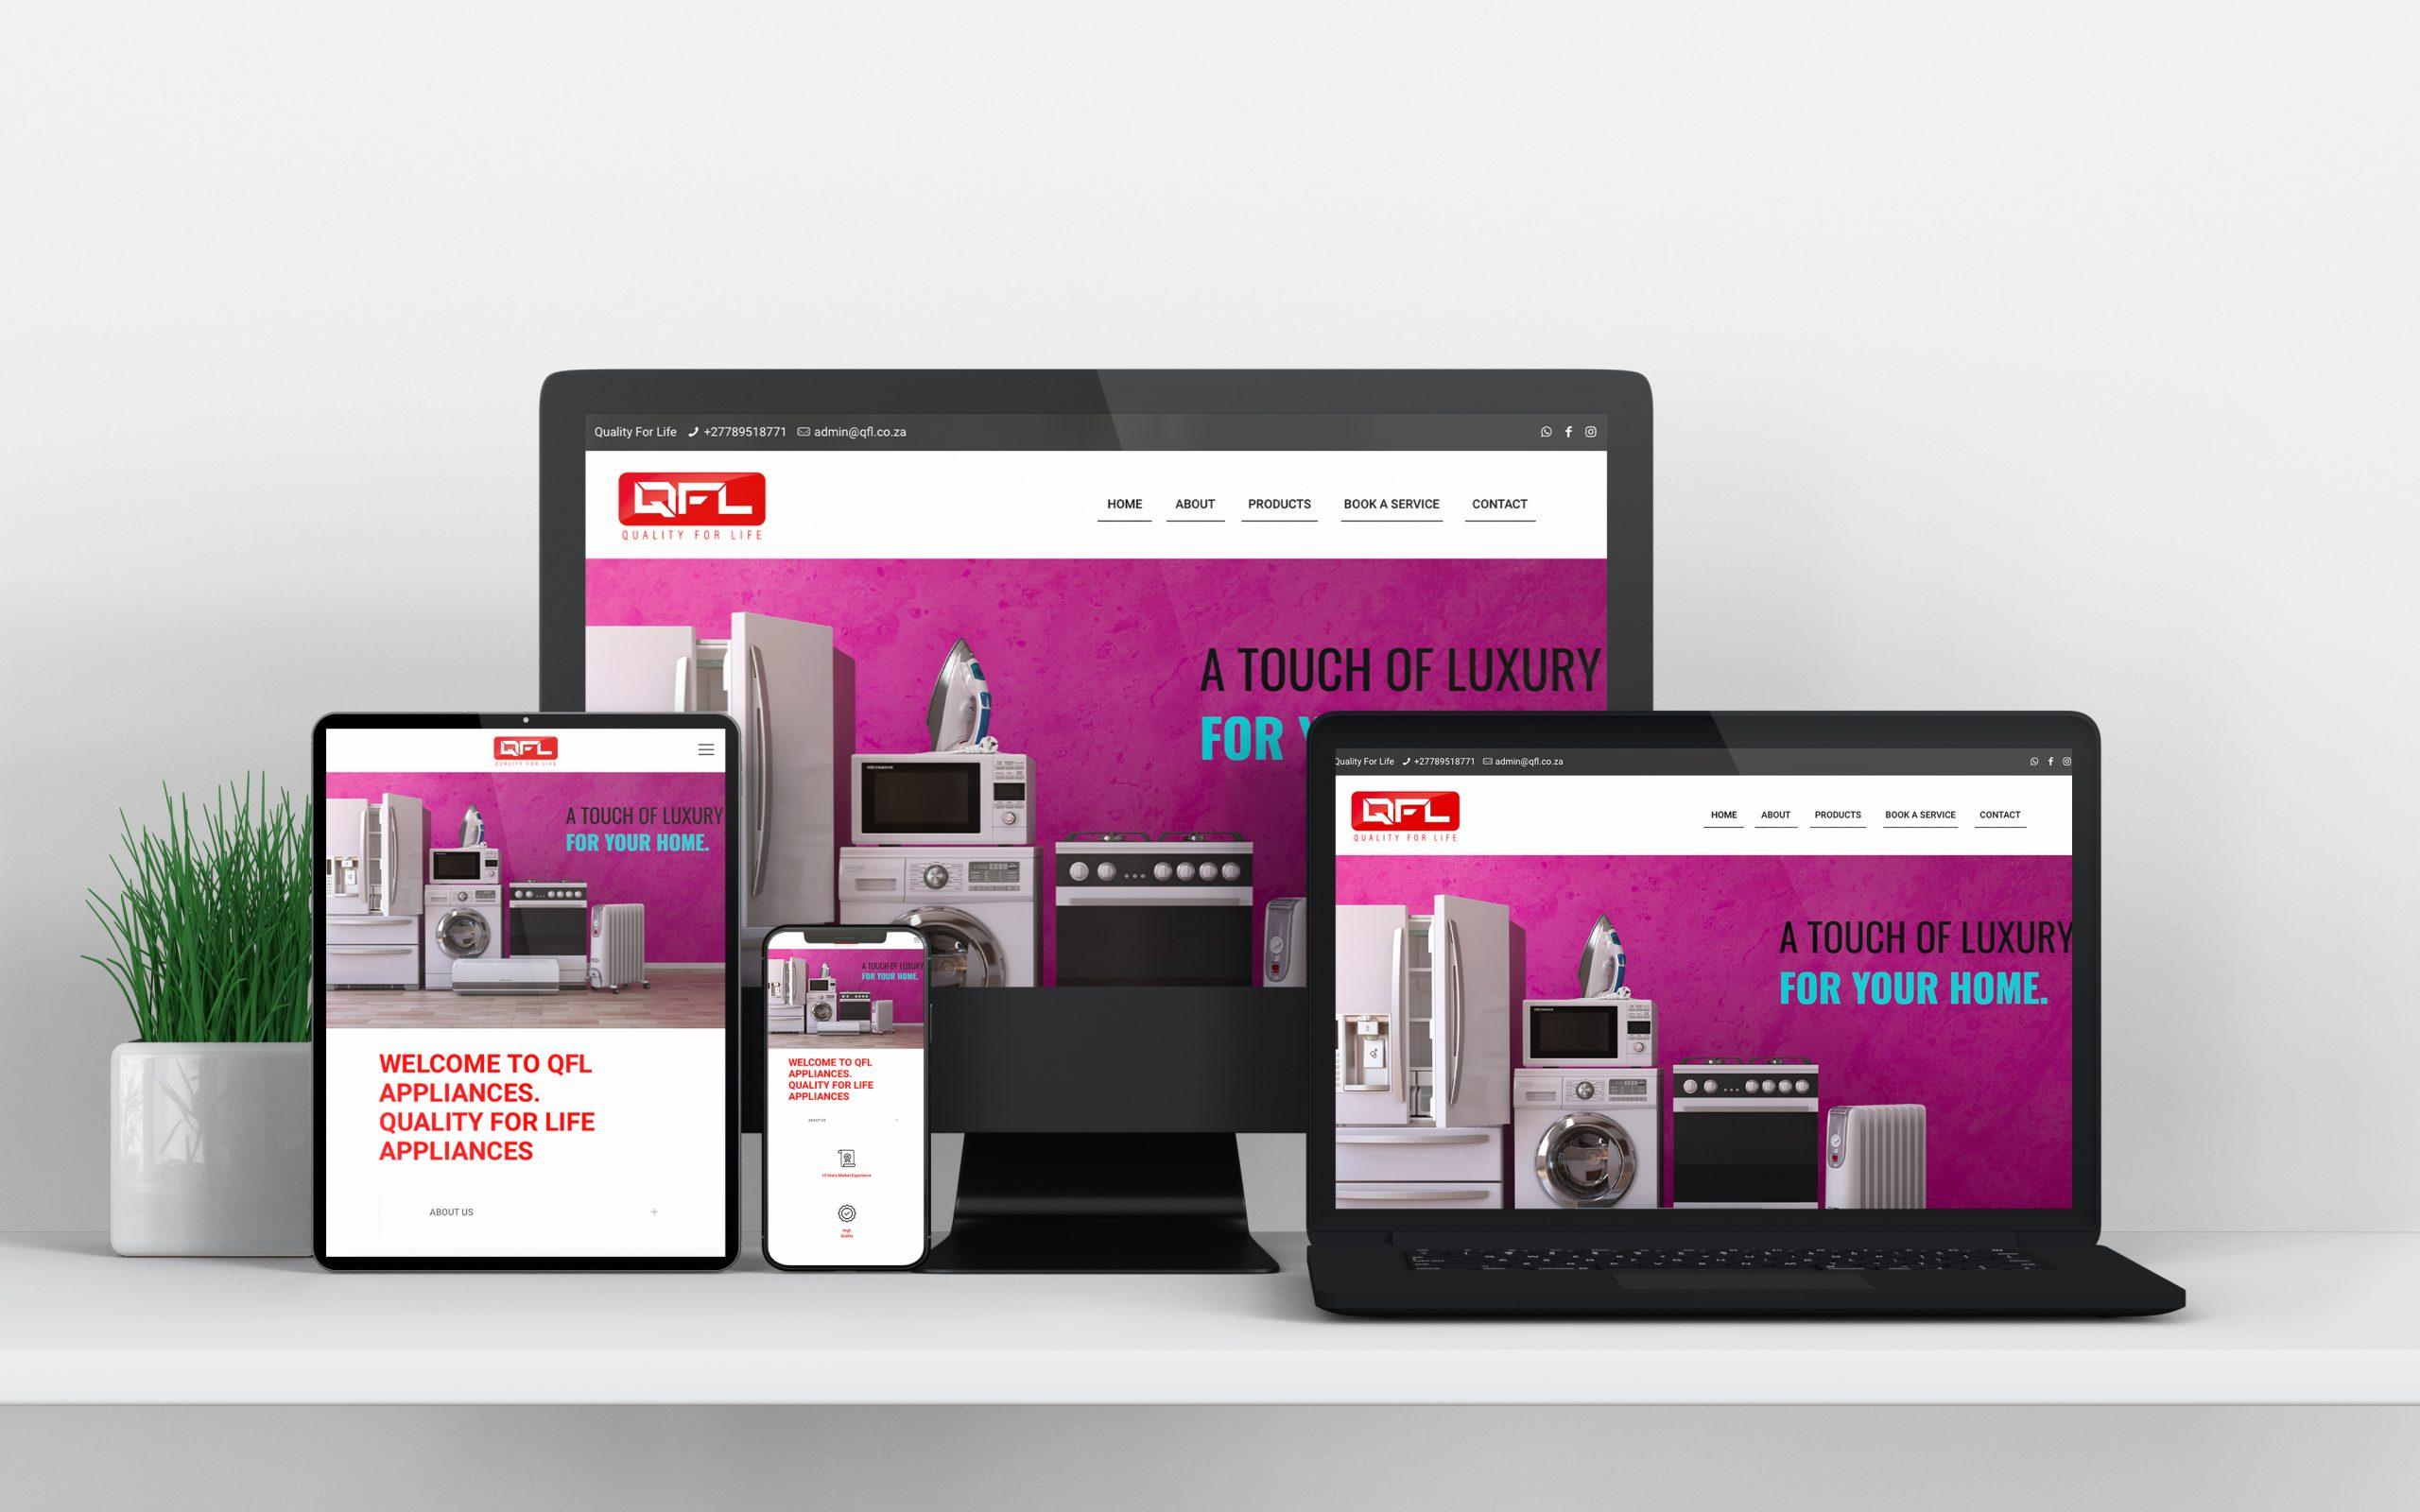 WordPress Website Design: Portfolio Mockup Image QFL